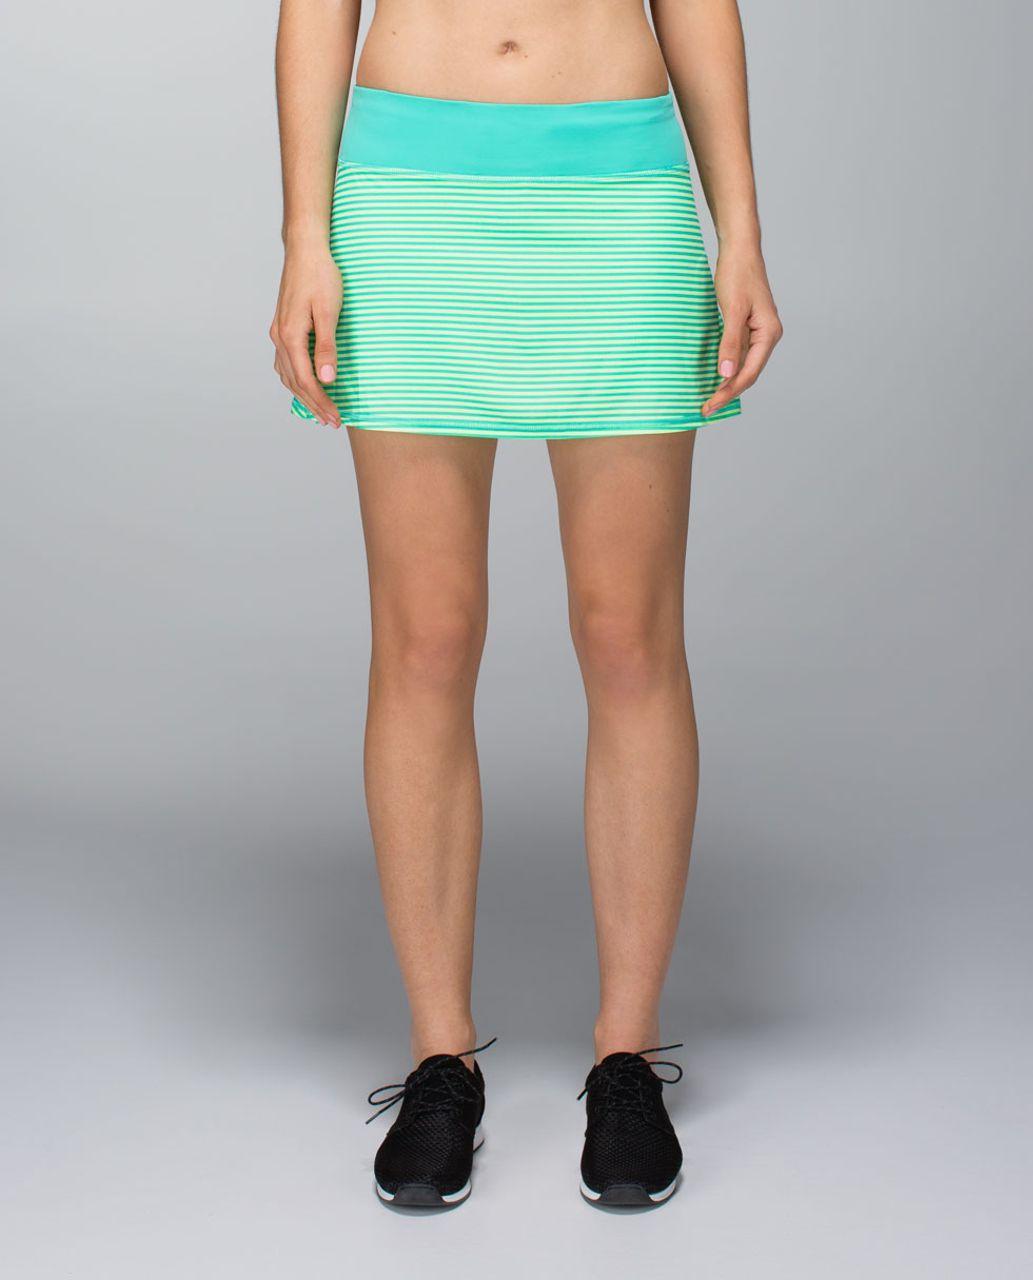 Lululemon Run:  Pace Setter Skirt (Regular) *4-way Stretch - 1 / 8 Stripe Printed Bali Breeze / Bali Breeze